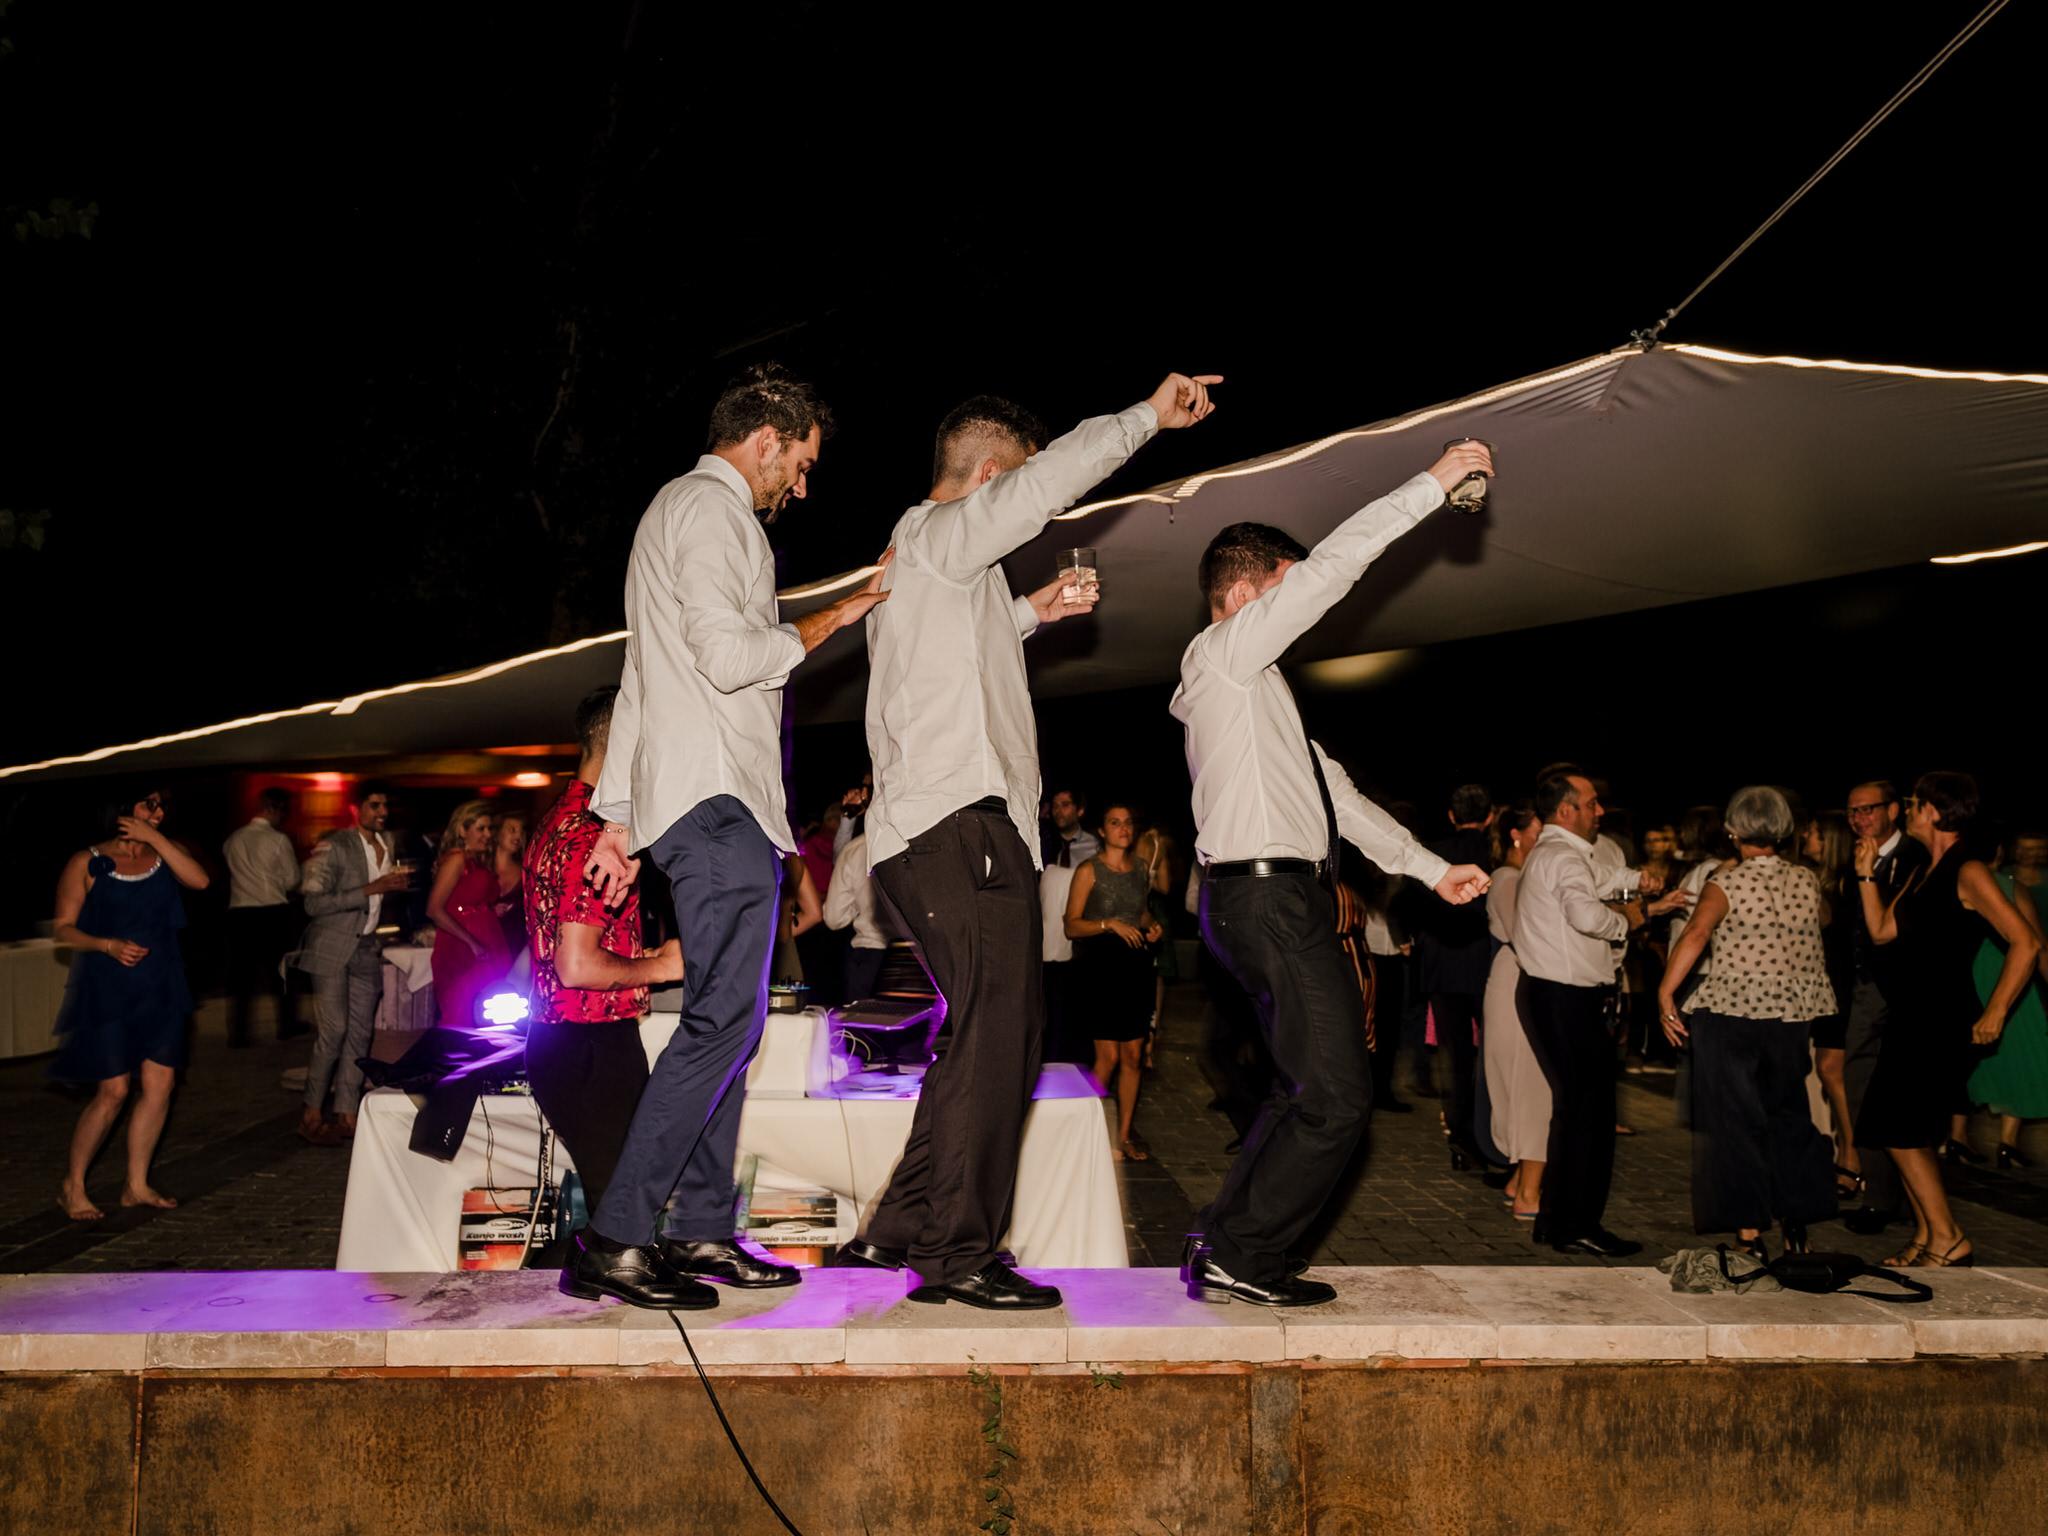 fiesta-dj-mrcong